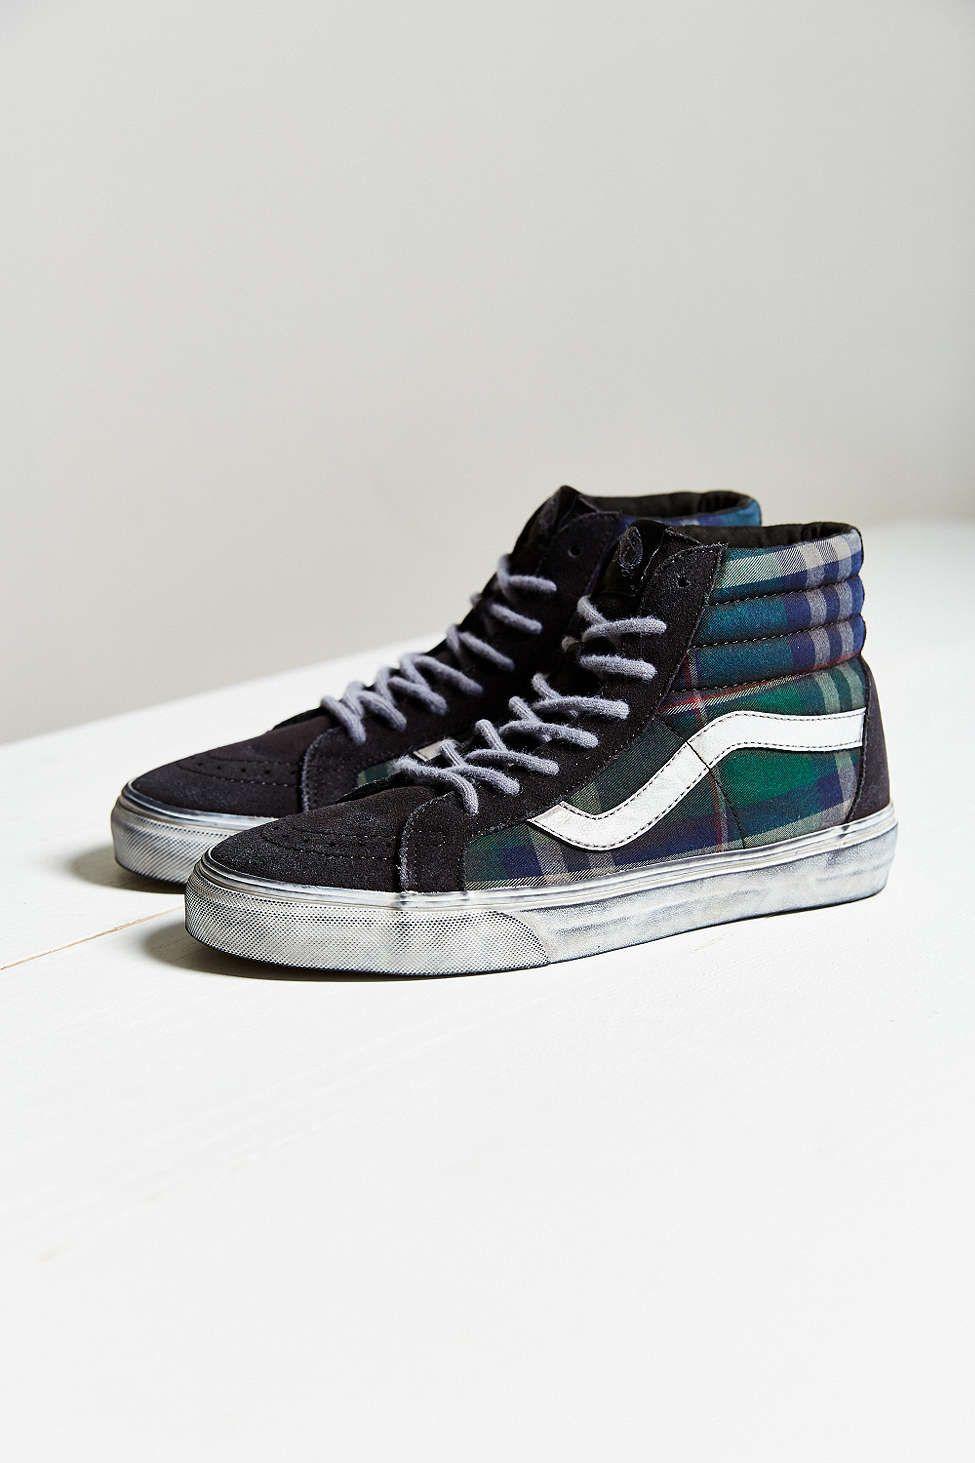 416c704559 Vans Sk8-Hi Overwashed Plaid Sneaker - Urban Outfitters